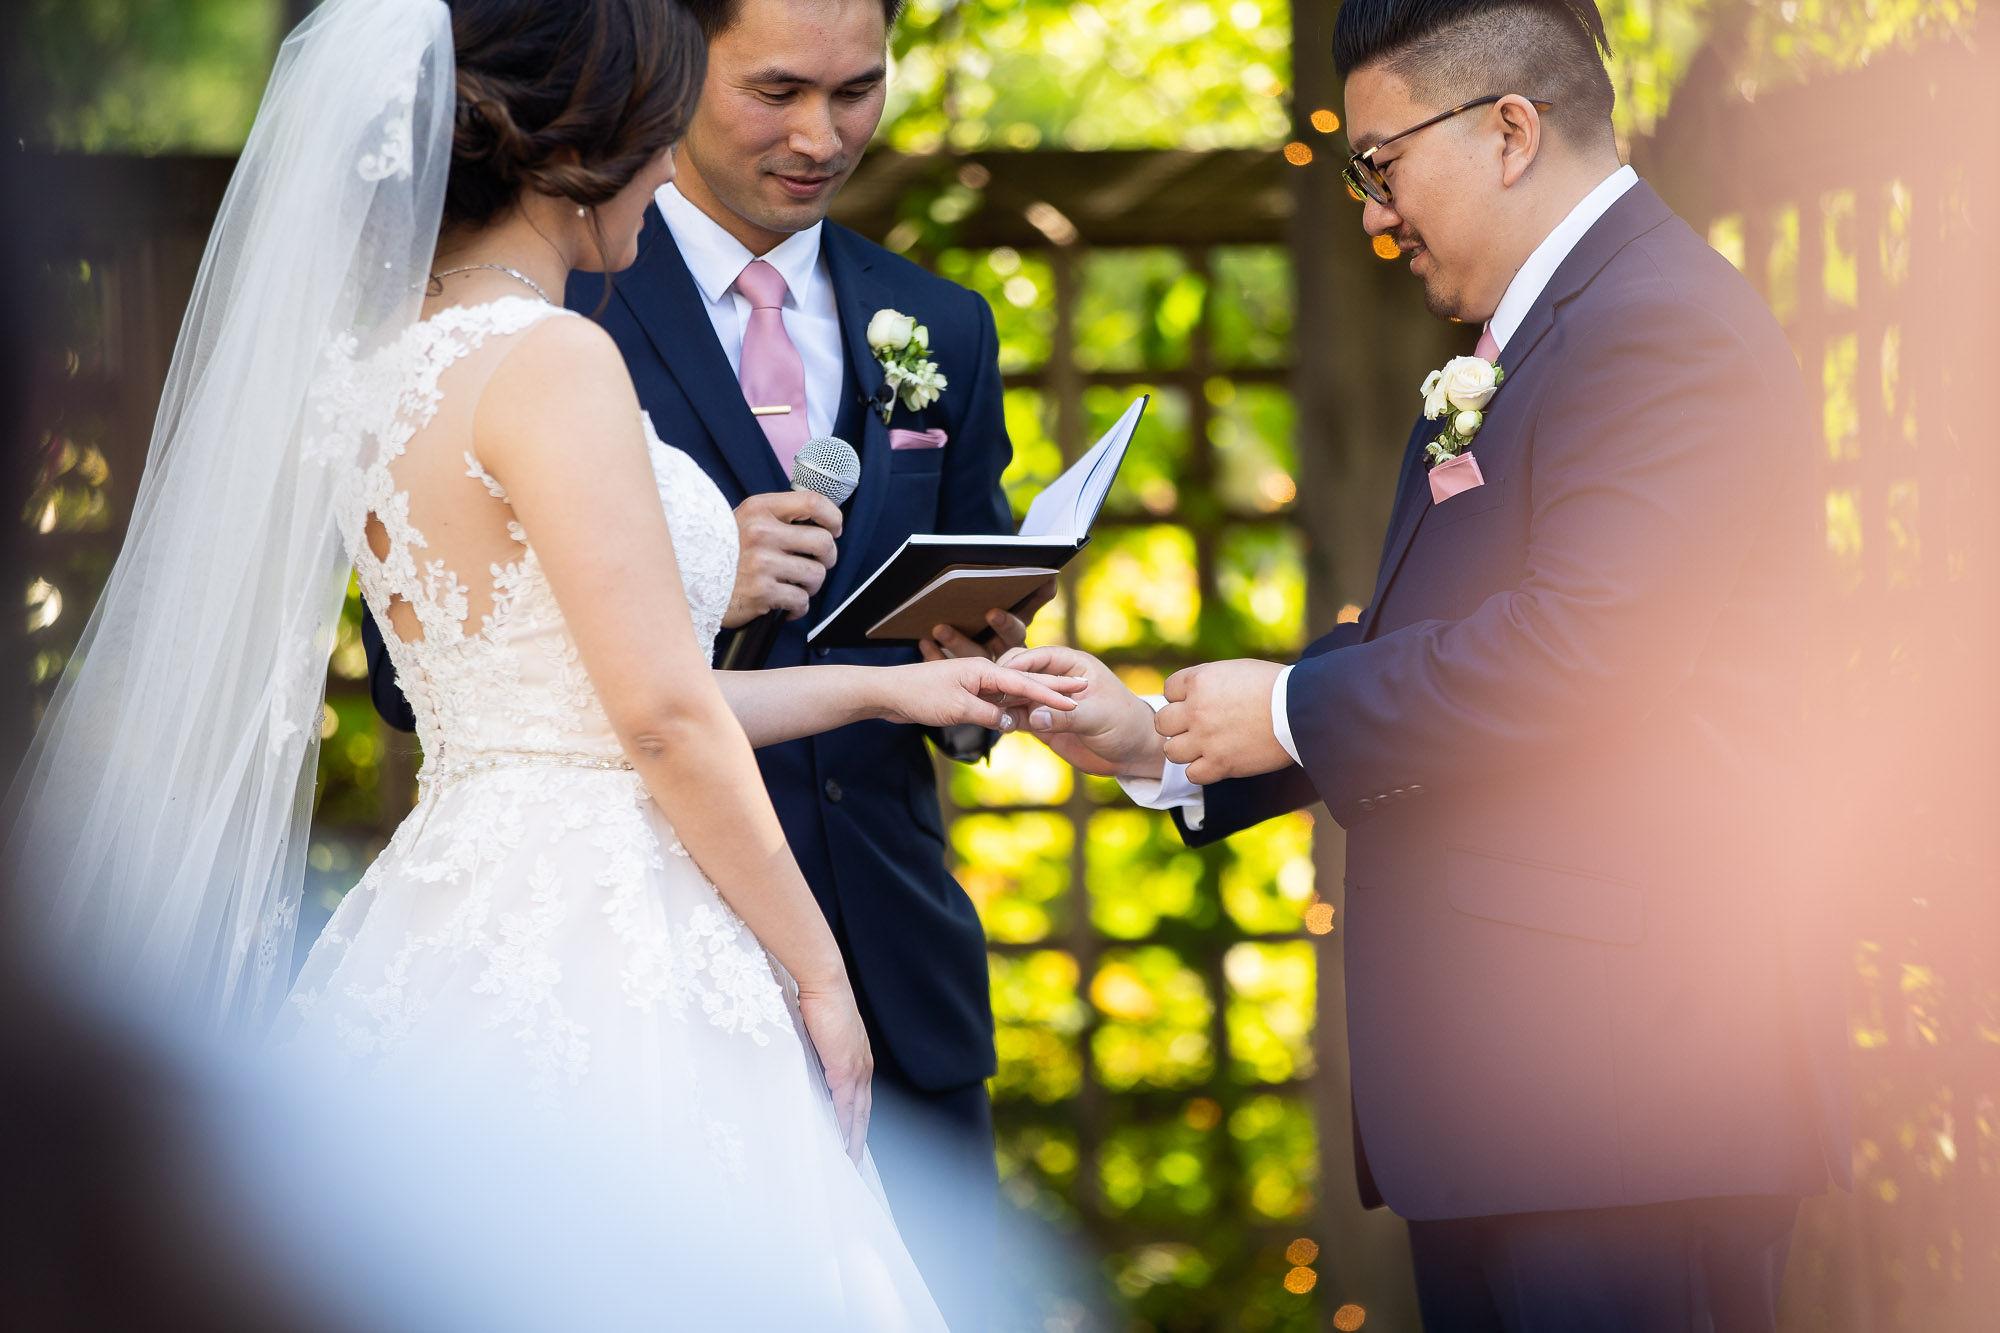 Resized-S&S-WeddingHighlights-26.jpg